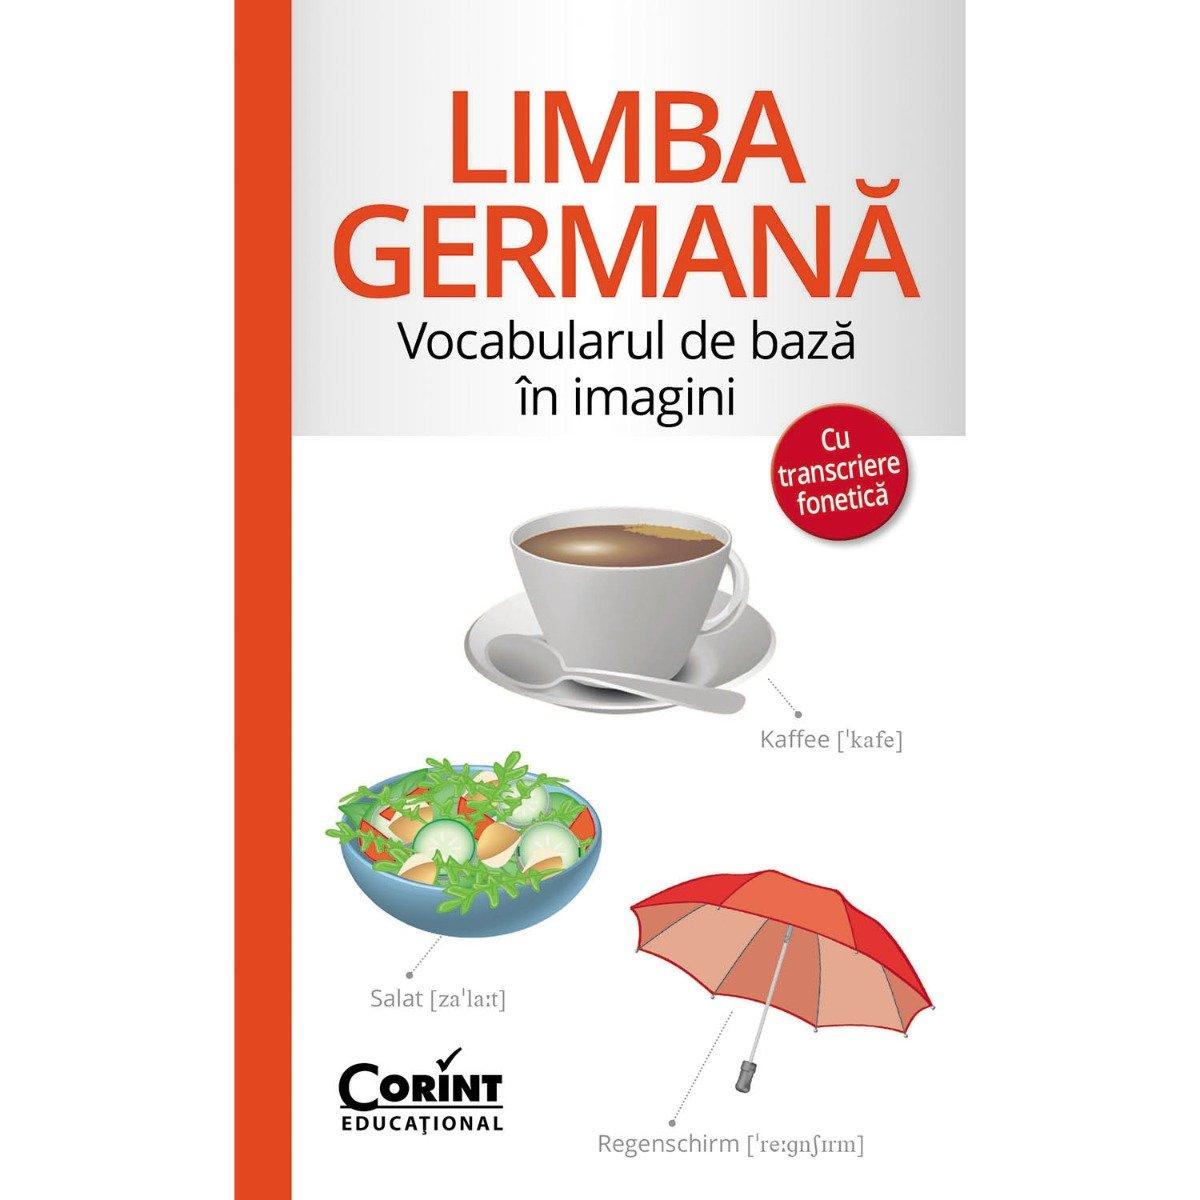 Carte Editura Corint, Vocabularul de baza in imagini cu transcriere fonetica. Limba germana